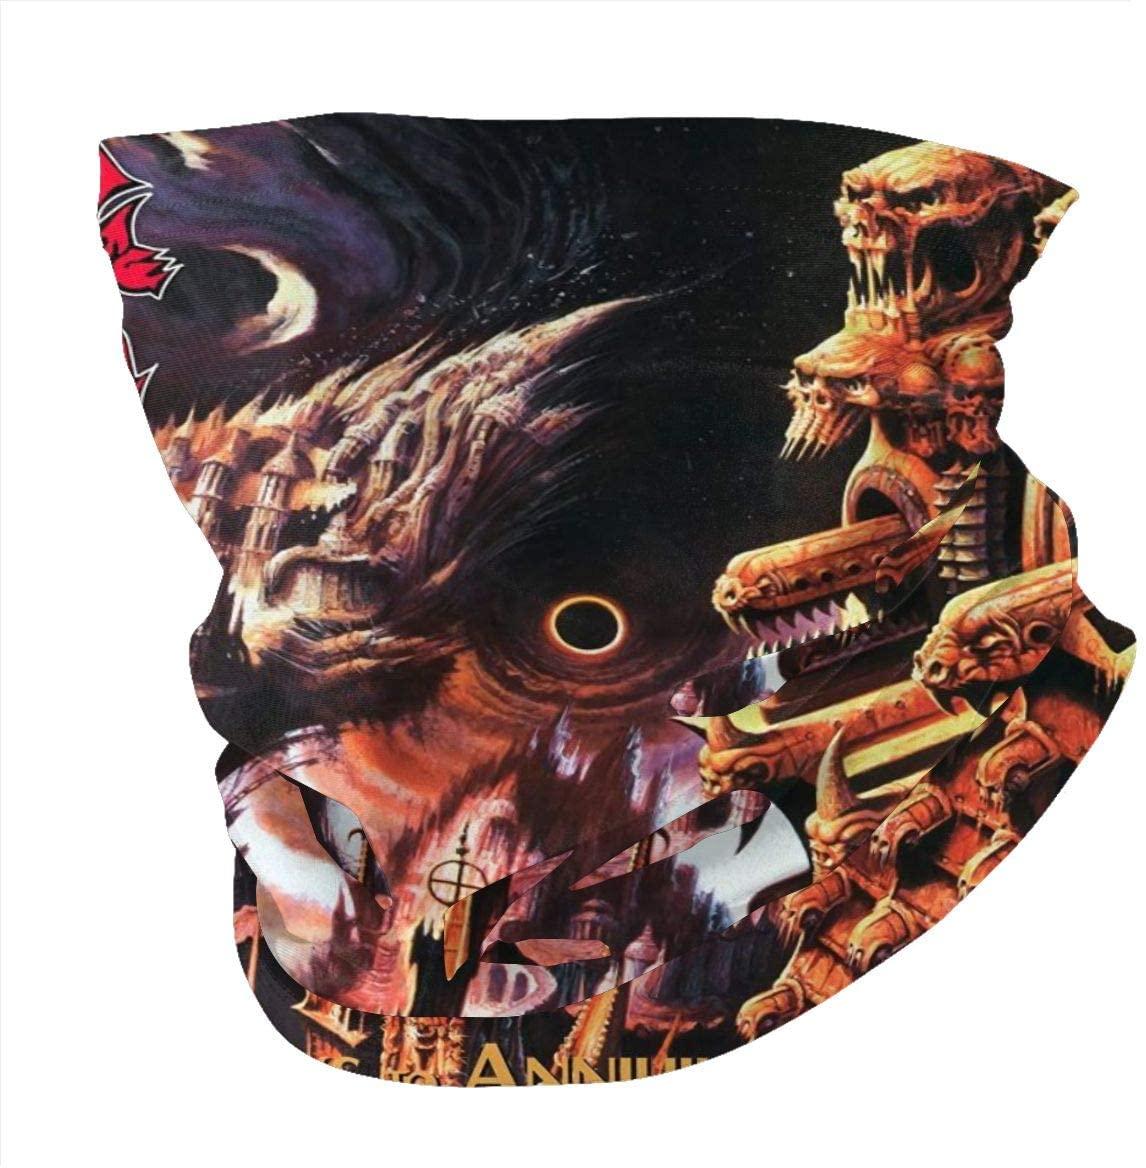 ColletteKMaddox Morbid Angel Gateways to Annihilation Microfiber Neck Warmer,Printed Scarf,Windproof Sports Masks,Warm Neck Scarf,Bandanas